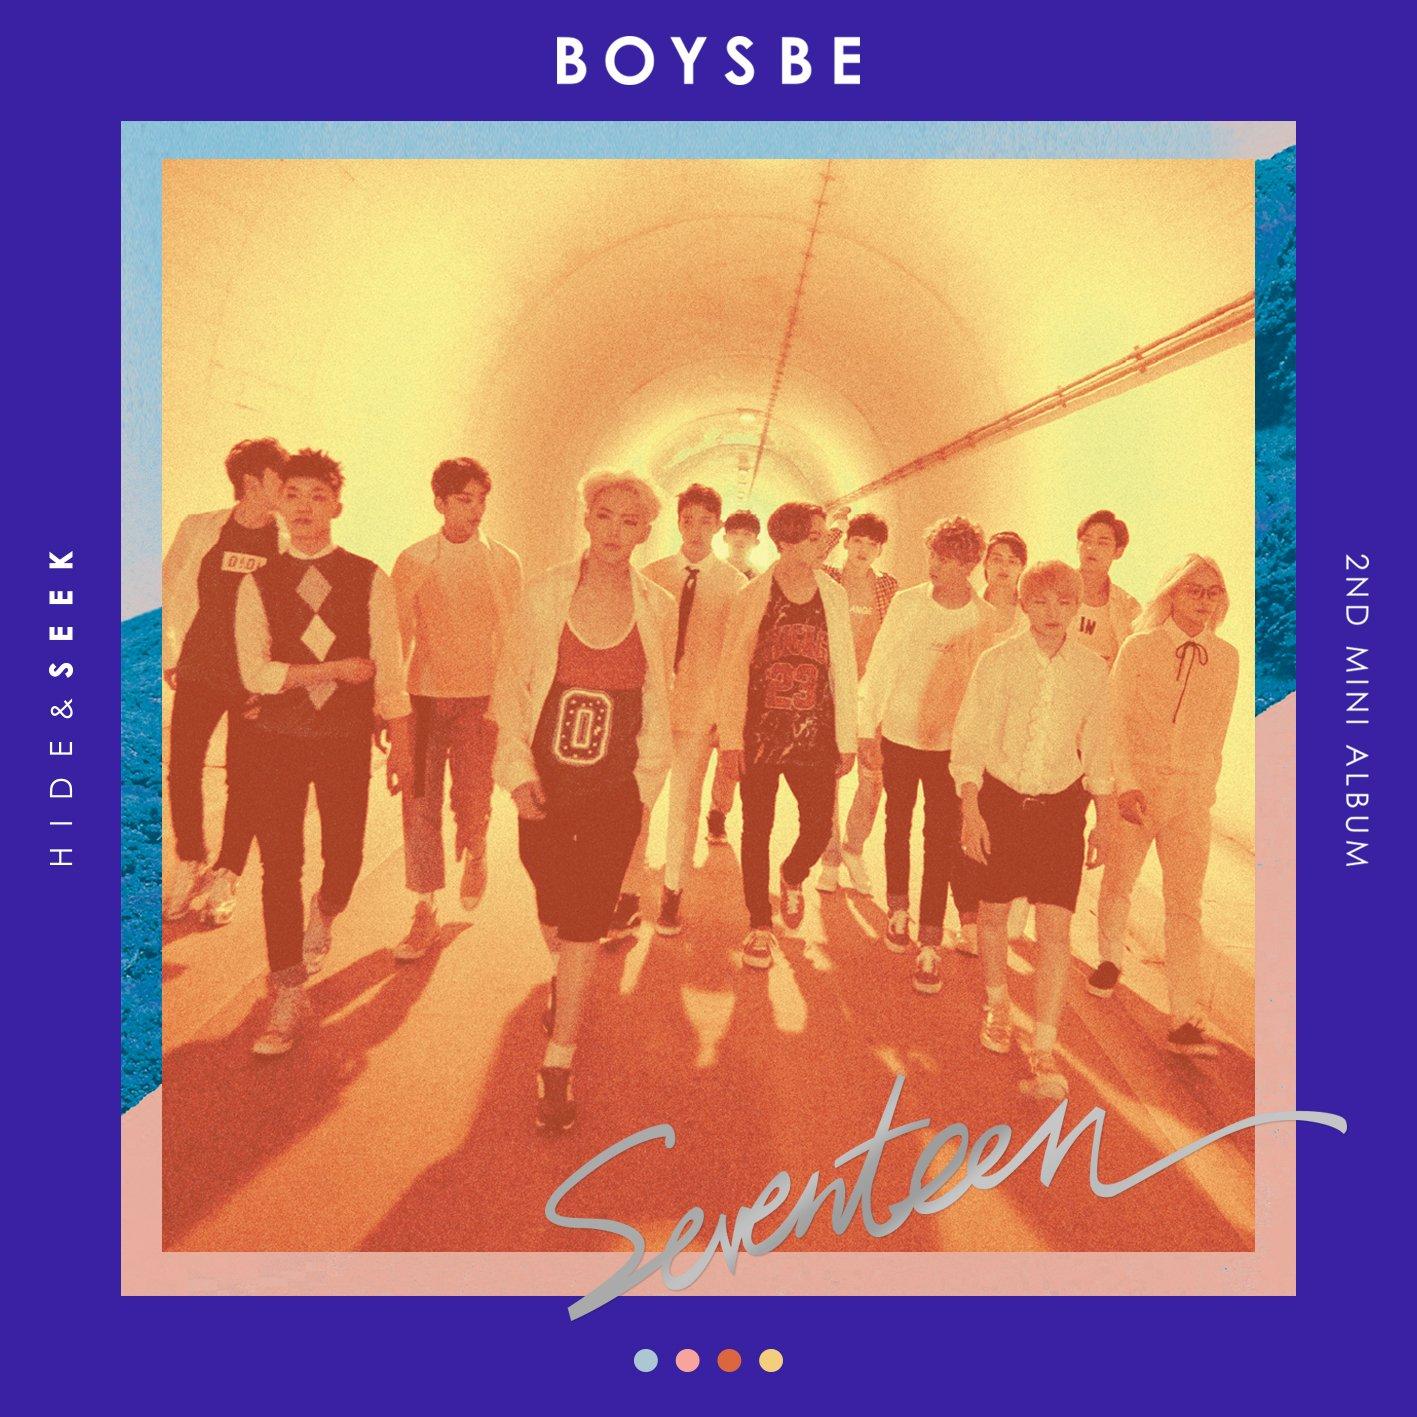 SEEK Ver. SEVENTEEN BOYS BE CD+Photobook+Photocard+Postcard+Map Poster+Gift